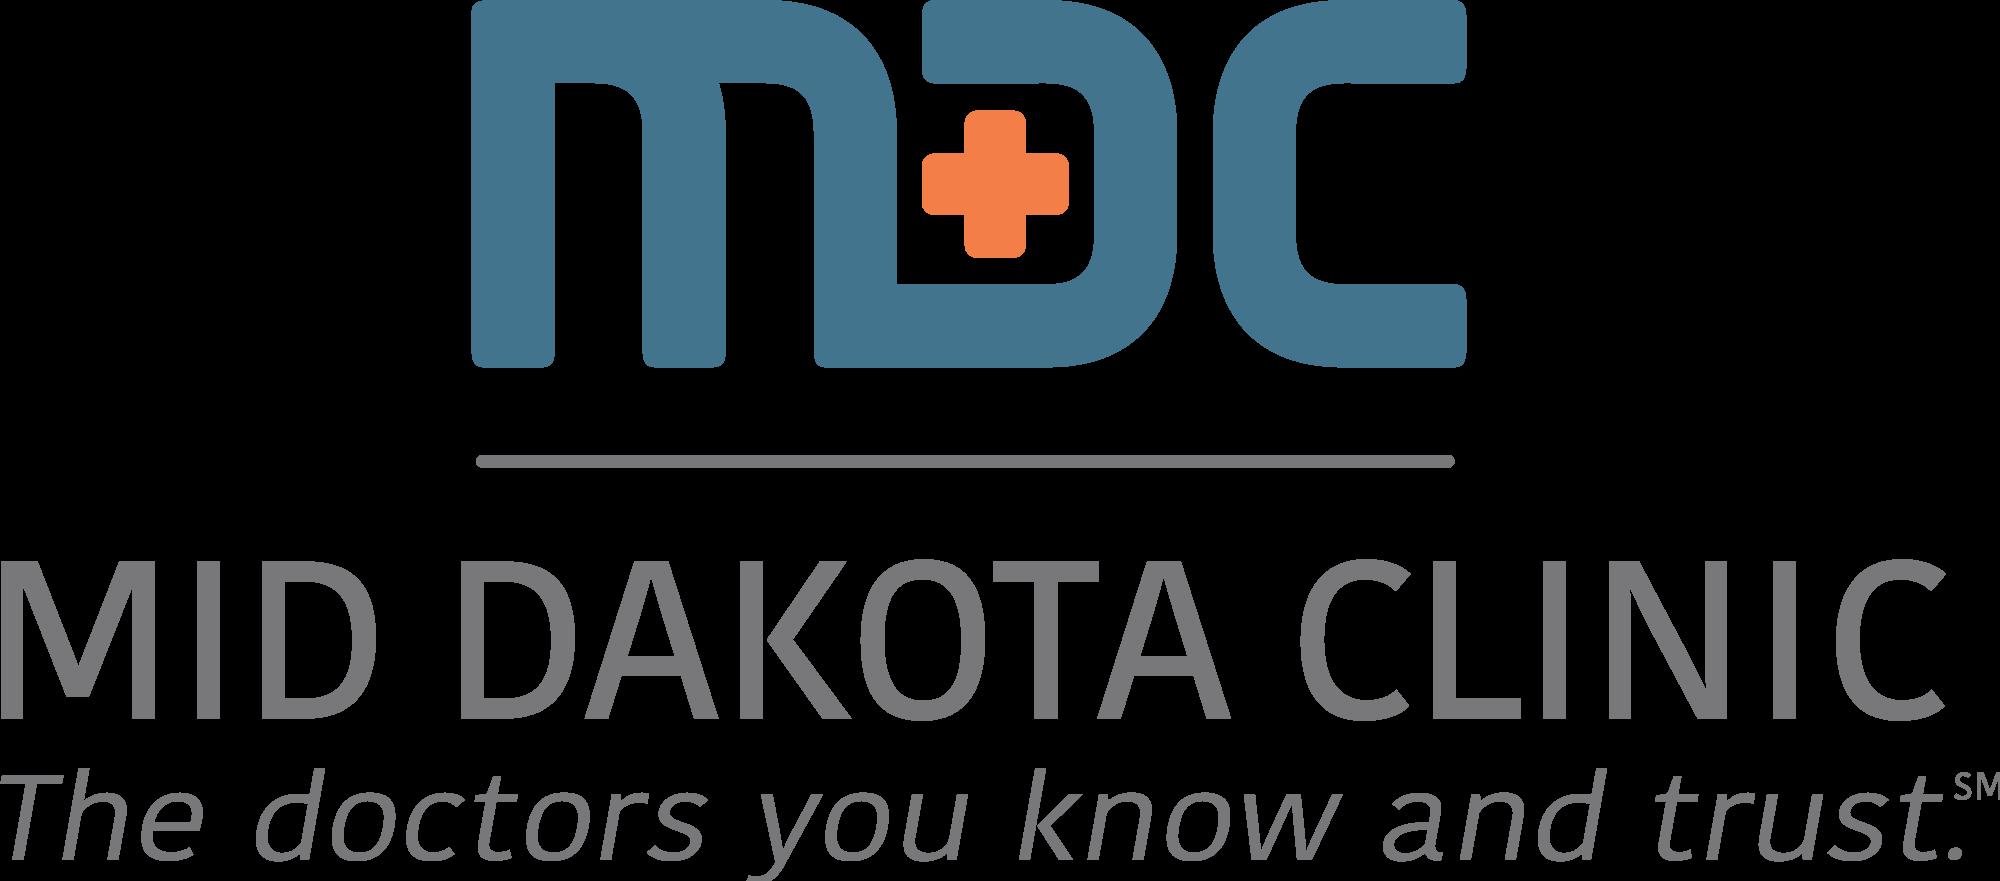 Mid Dakota Clinic logo